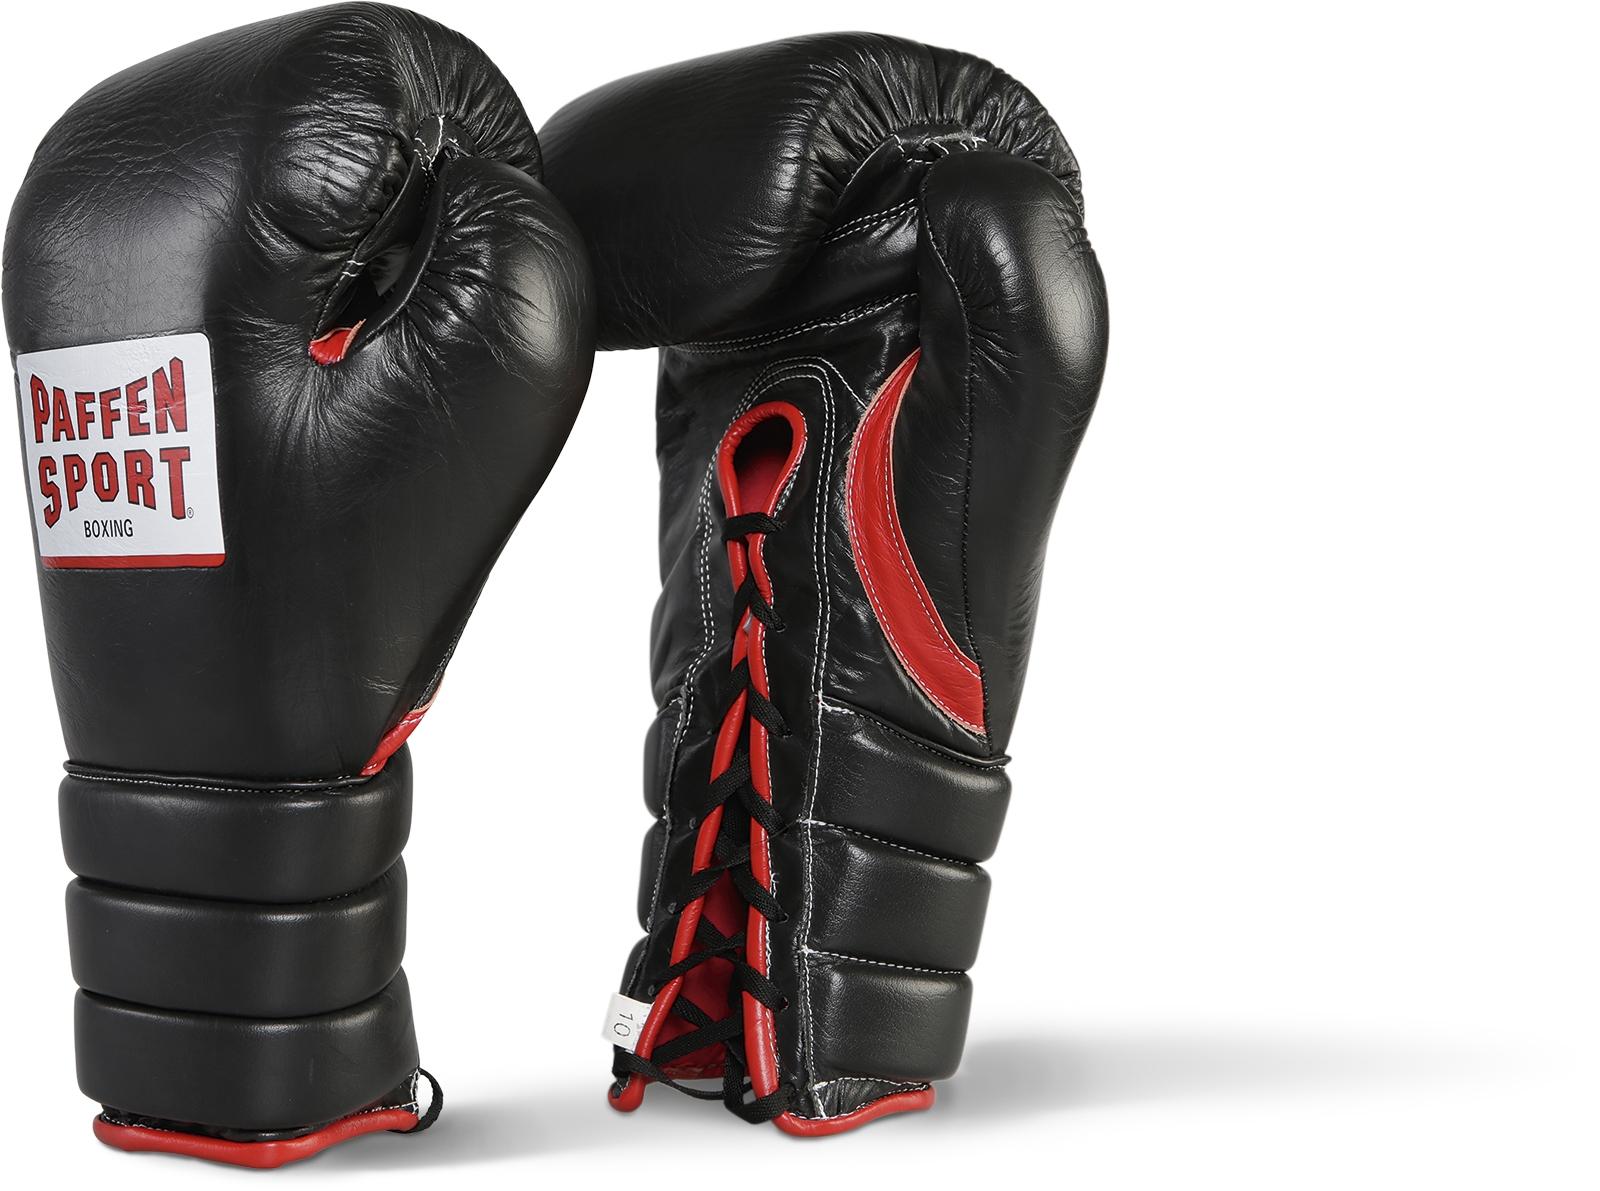 Paffen Sport Pro Guard Bokshandschoenen - Zwart / Rood - 8 oz